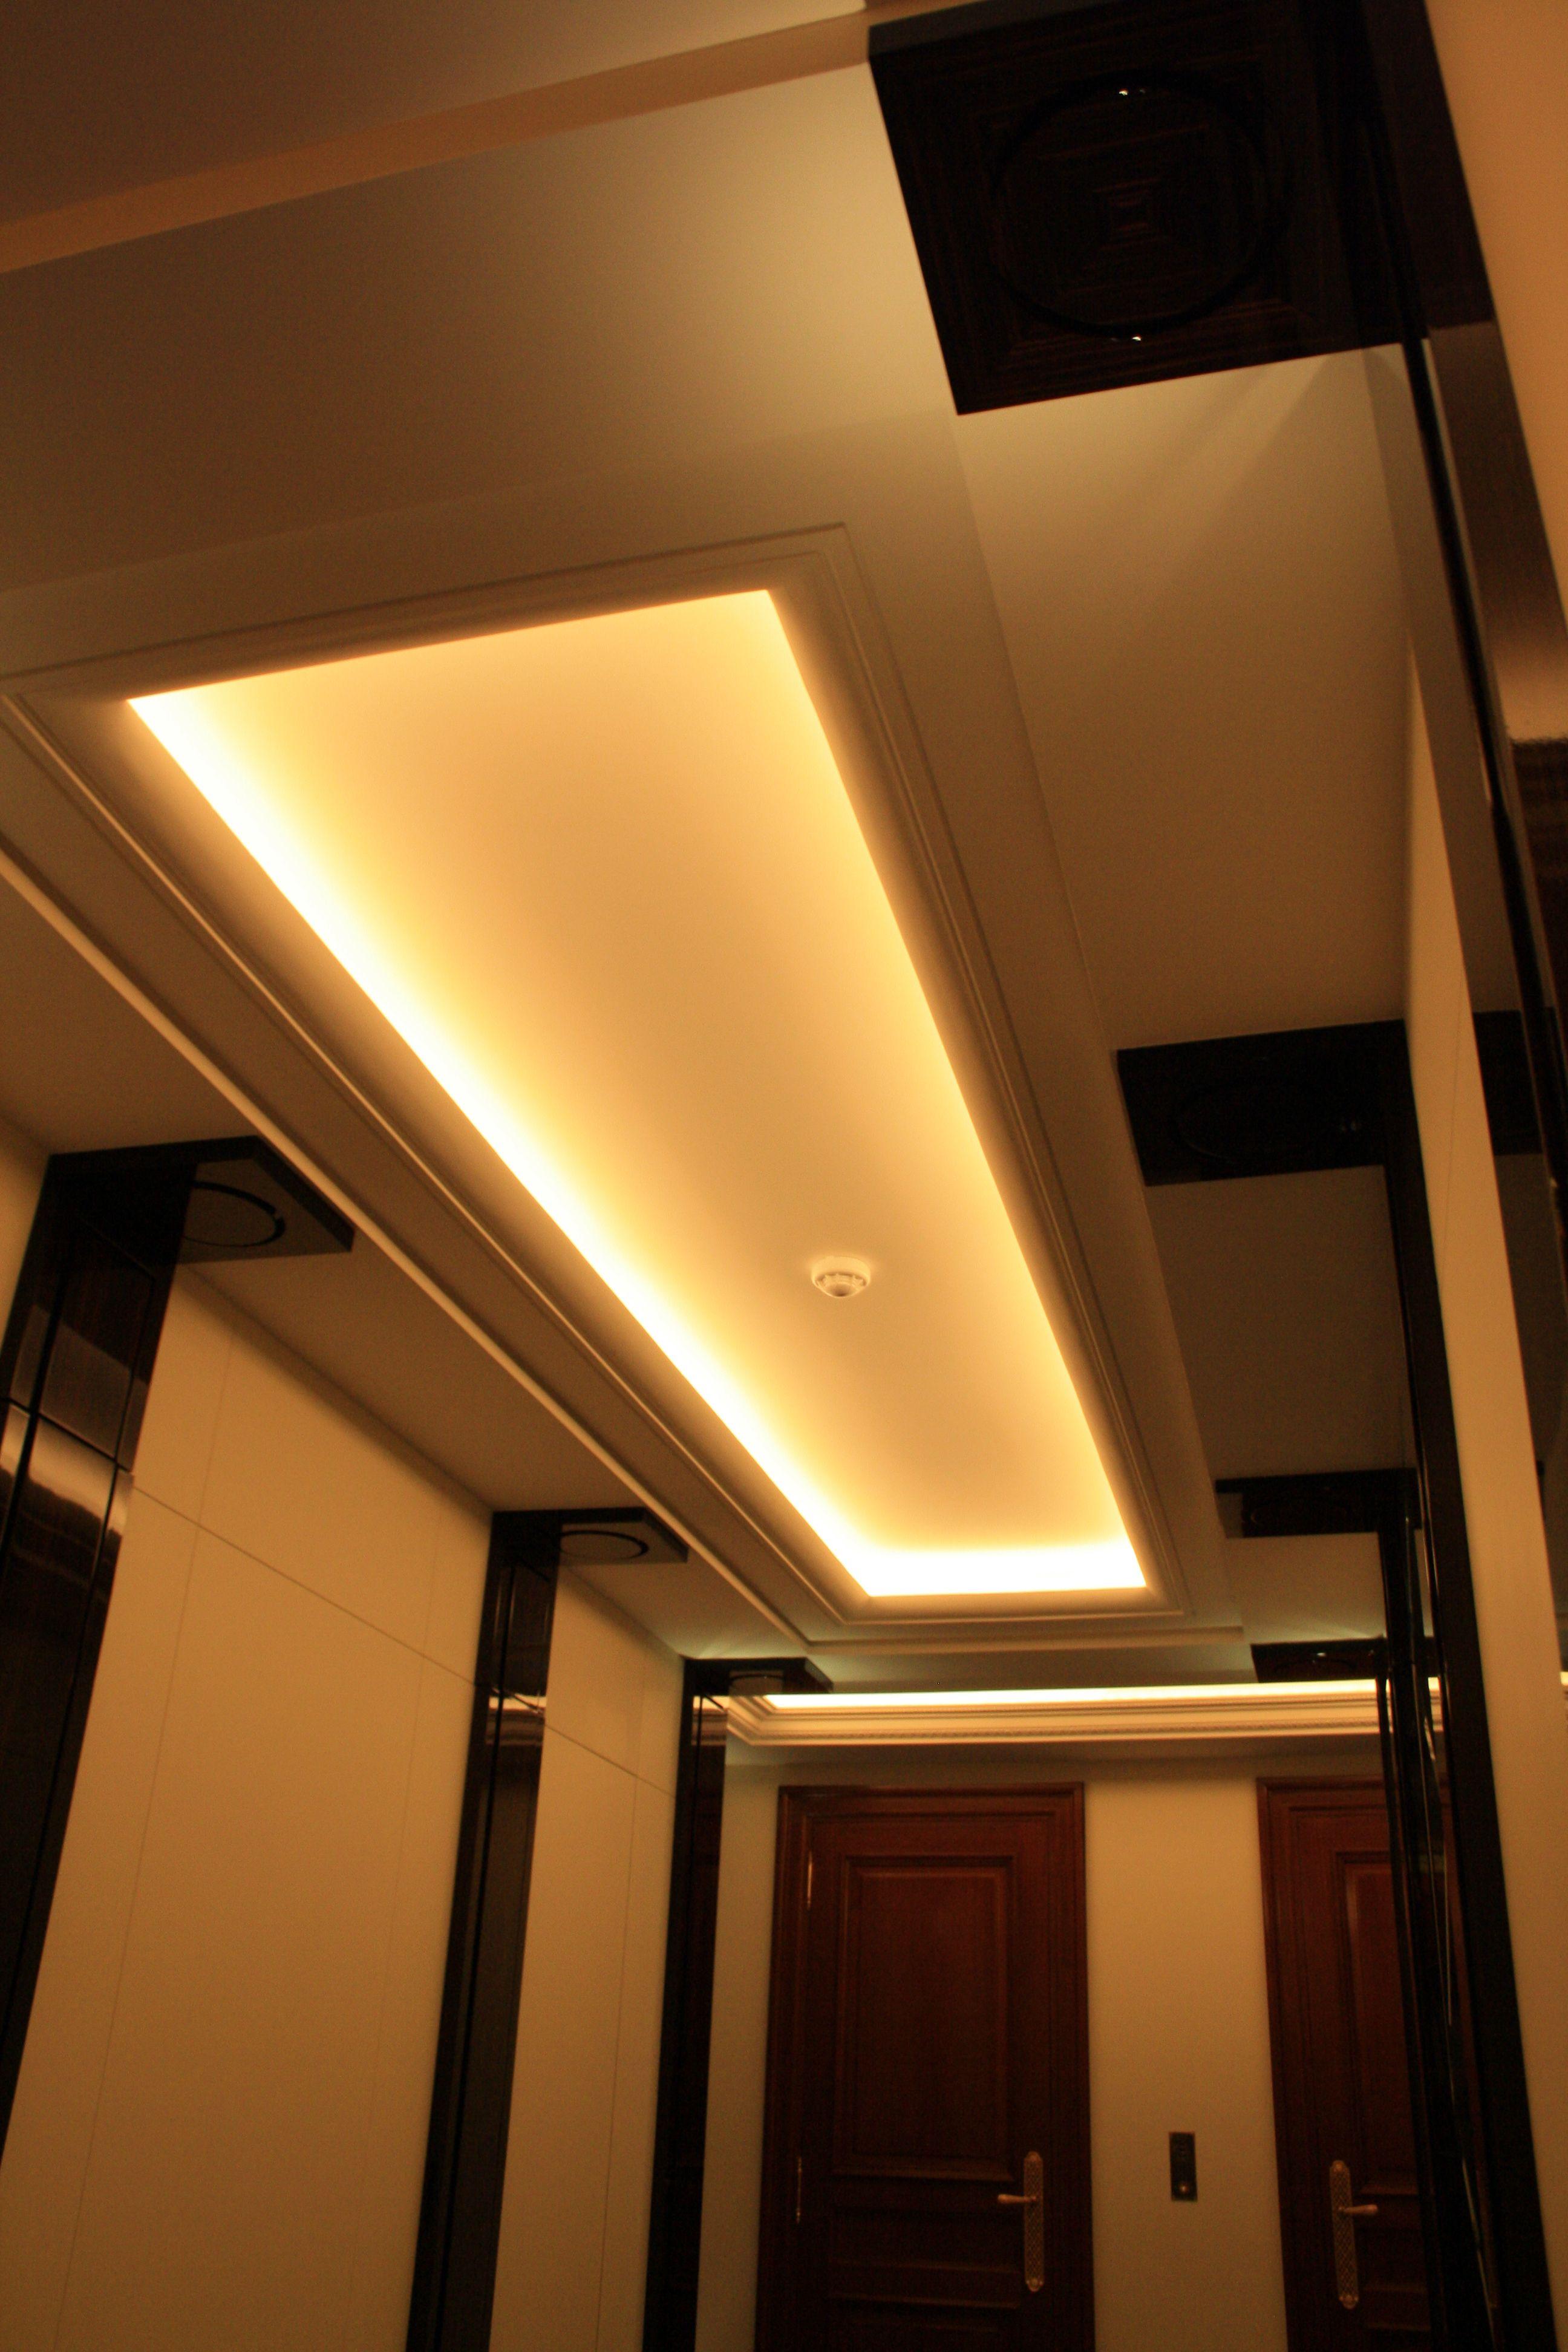 Plafond moderne staff plafond staff design gips decke for Staff plafond salon